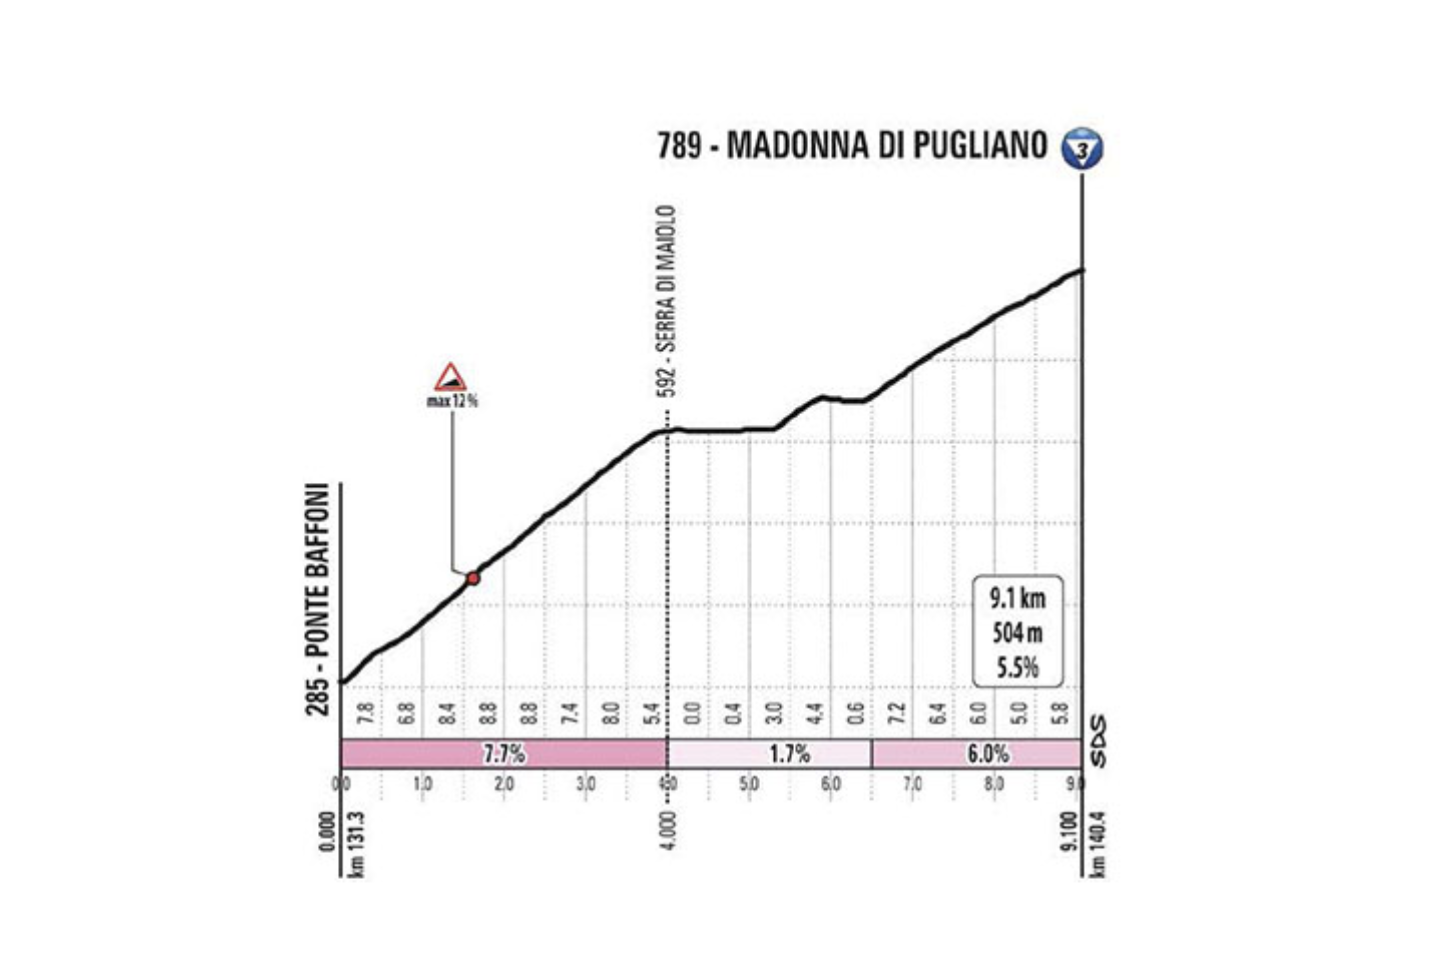 giro 2020 stage 12 climb 4